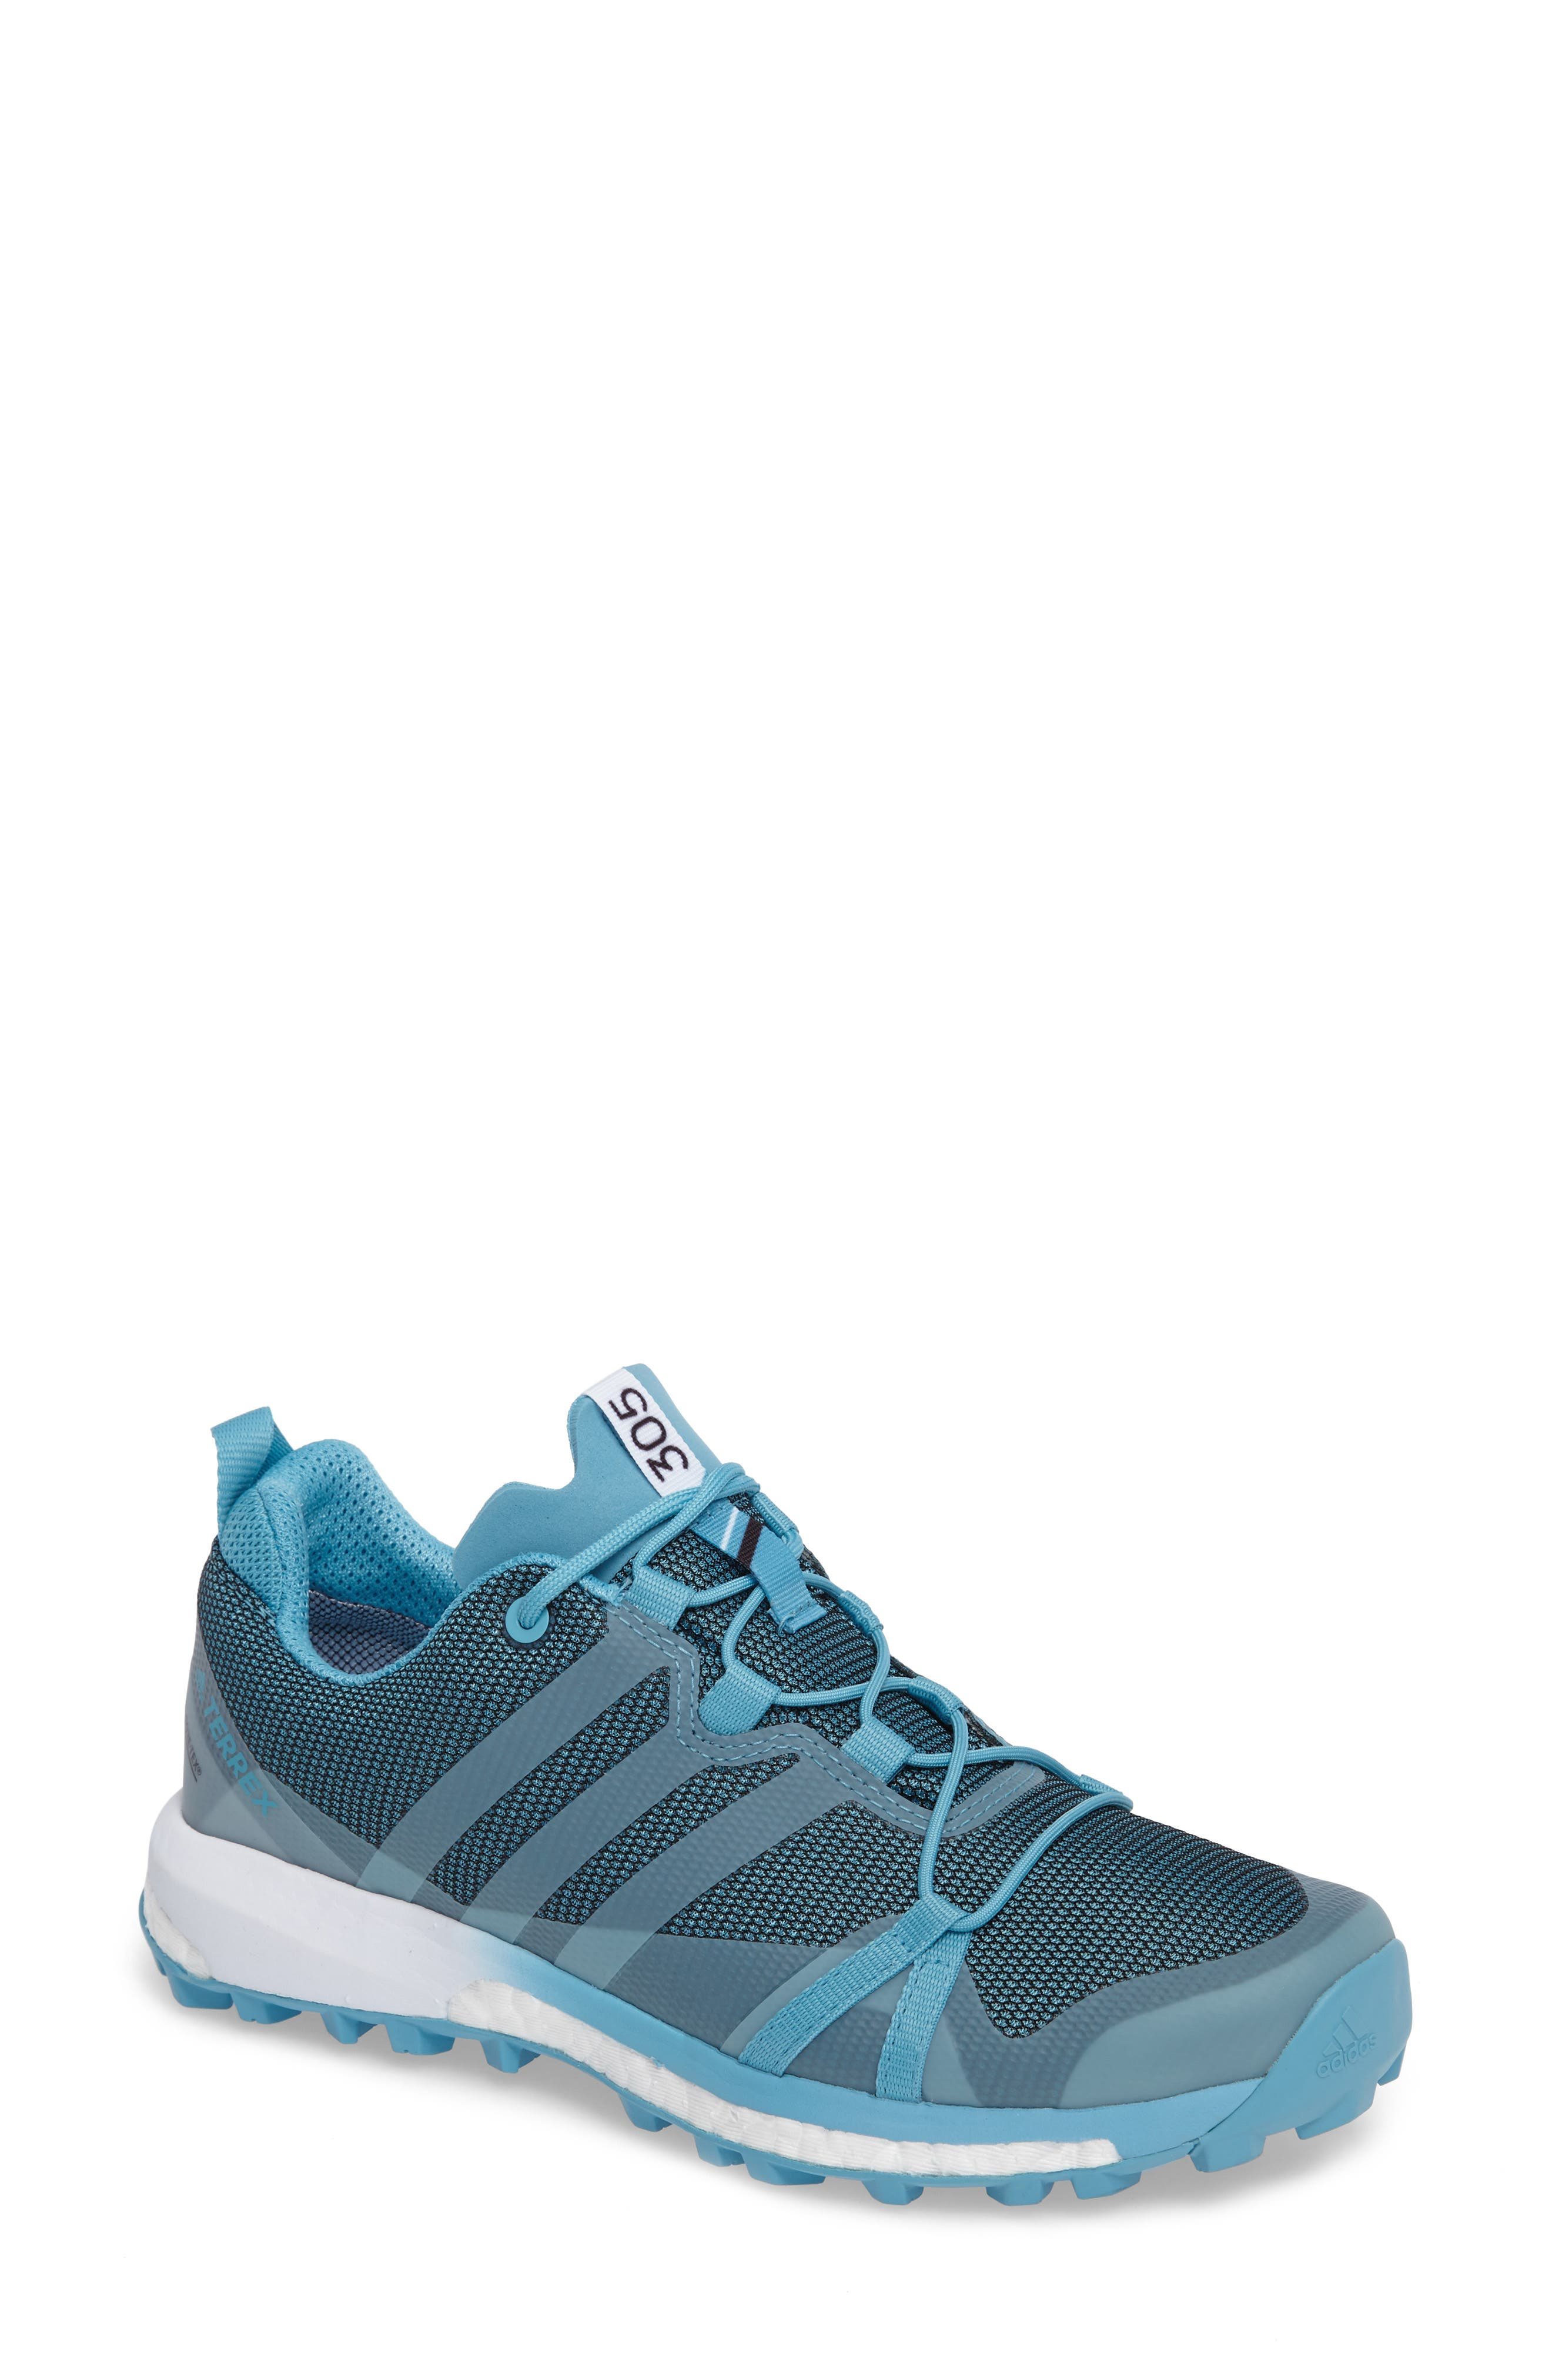 Alternate Image 1 Selected - adidas 'Terrex Agravic GTX' Trail Shoe (Women)